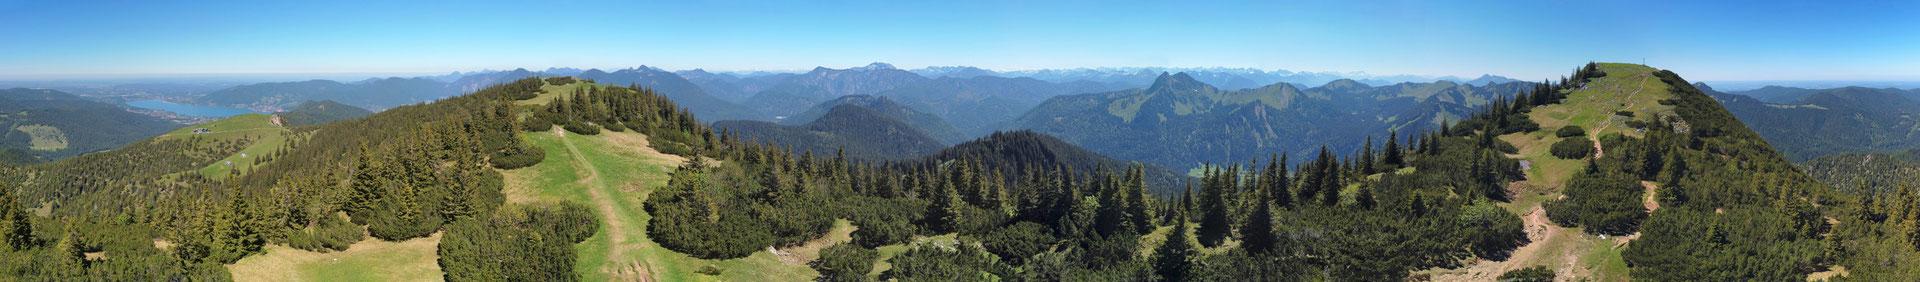 Panorama - Drohnenfoto - Landschaft - Bayern - Berge - Alpen - Sommer - Ausflug - Wanderung - Hirschberg 360 Grad